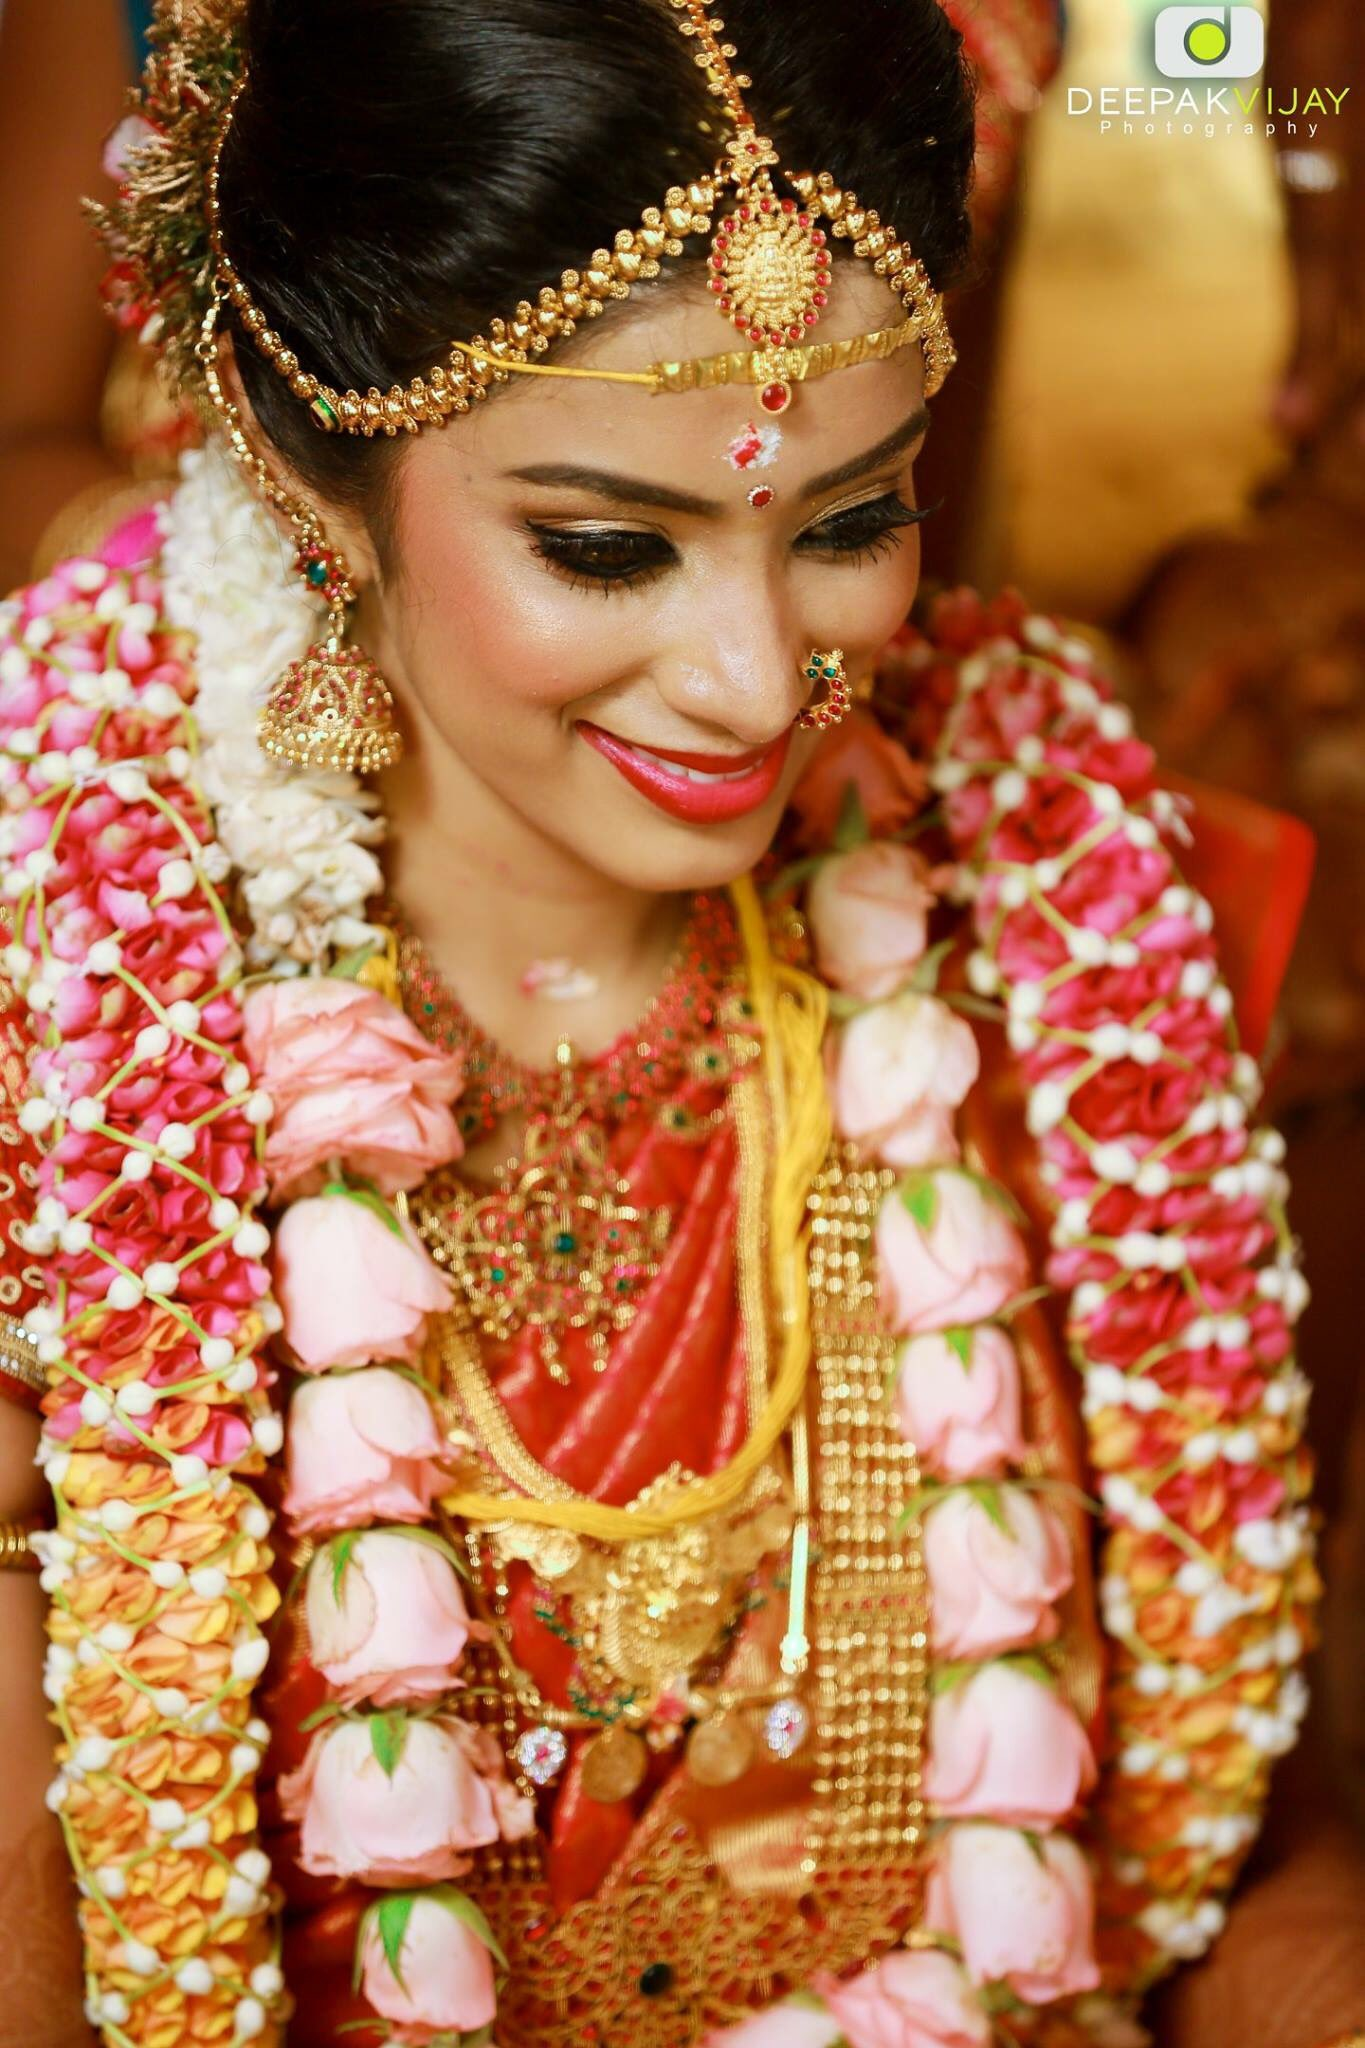 Wedding Girl Wallpaper Diya Vj On Twitter Quot Wedding Pics 😘💋 ️😍💃 Https T Co